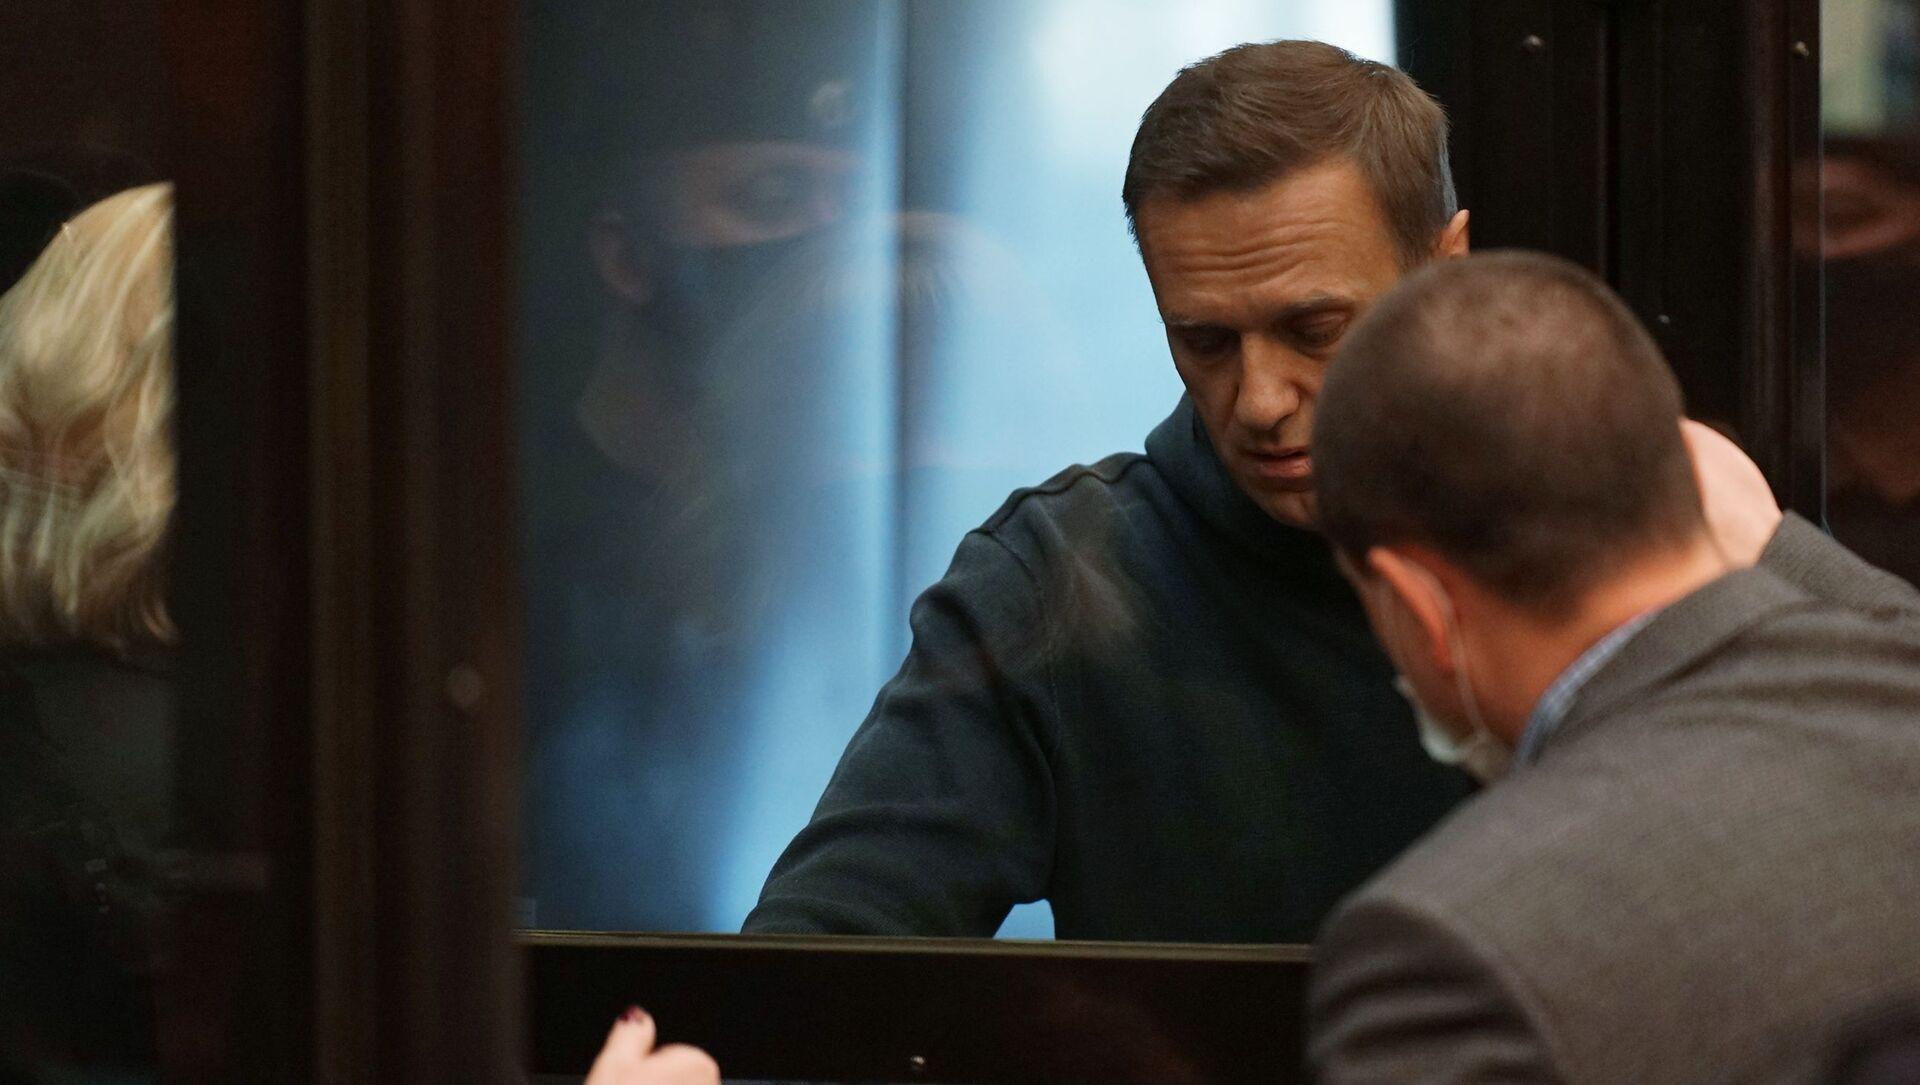 Alexey Navalny durante l'udienza - Sputnik Italia, 1920, 02.02.2021